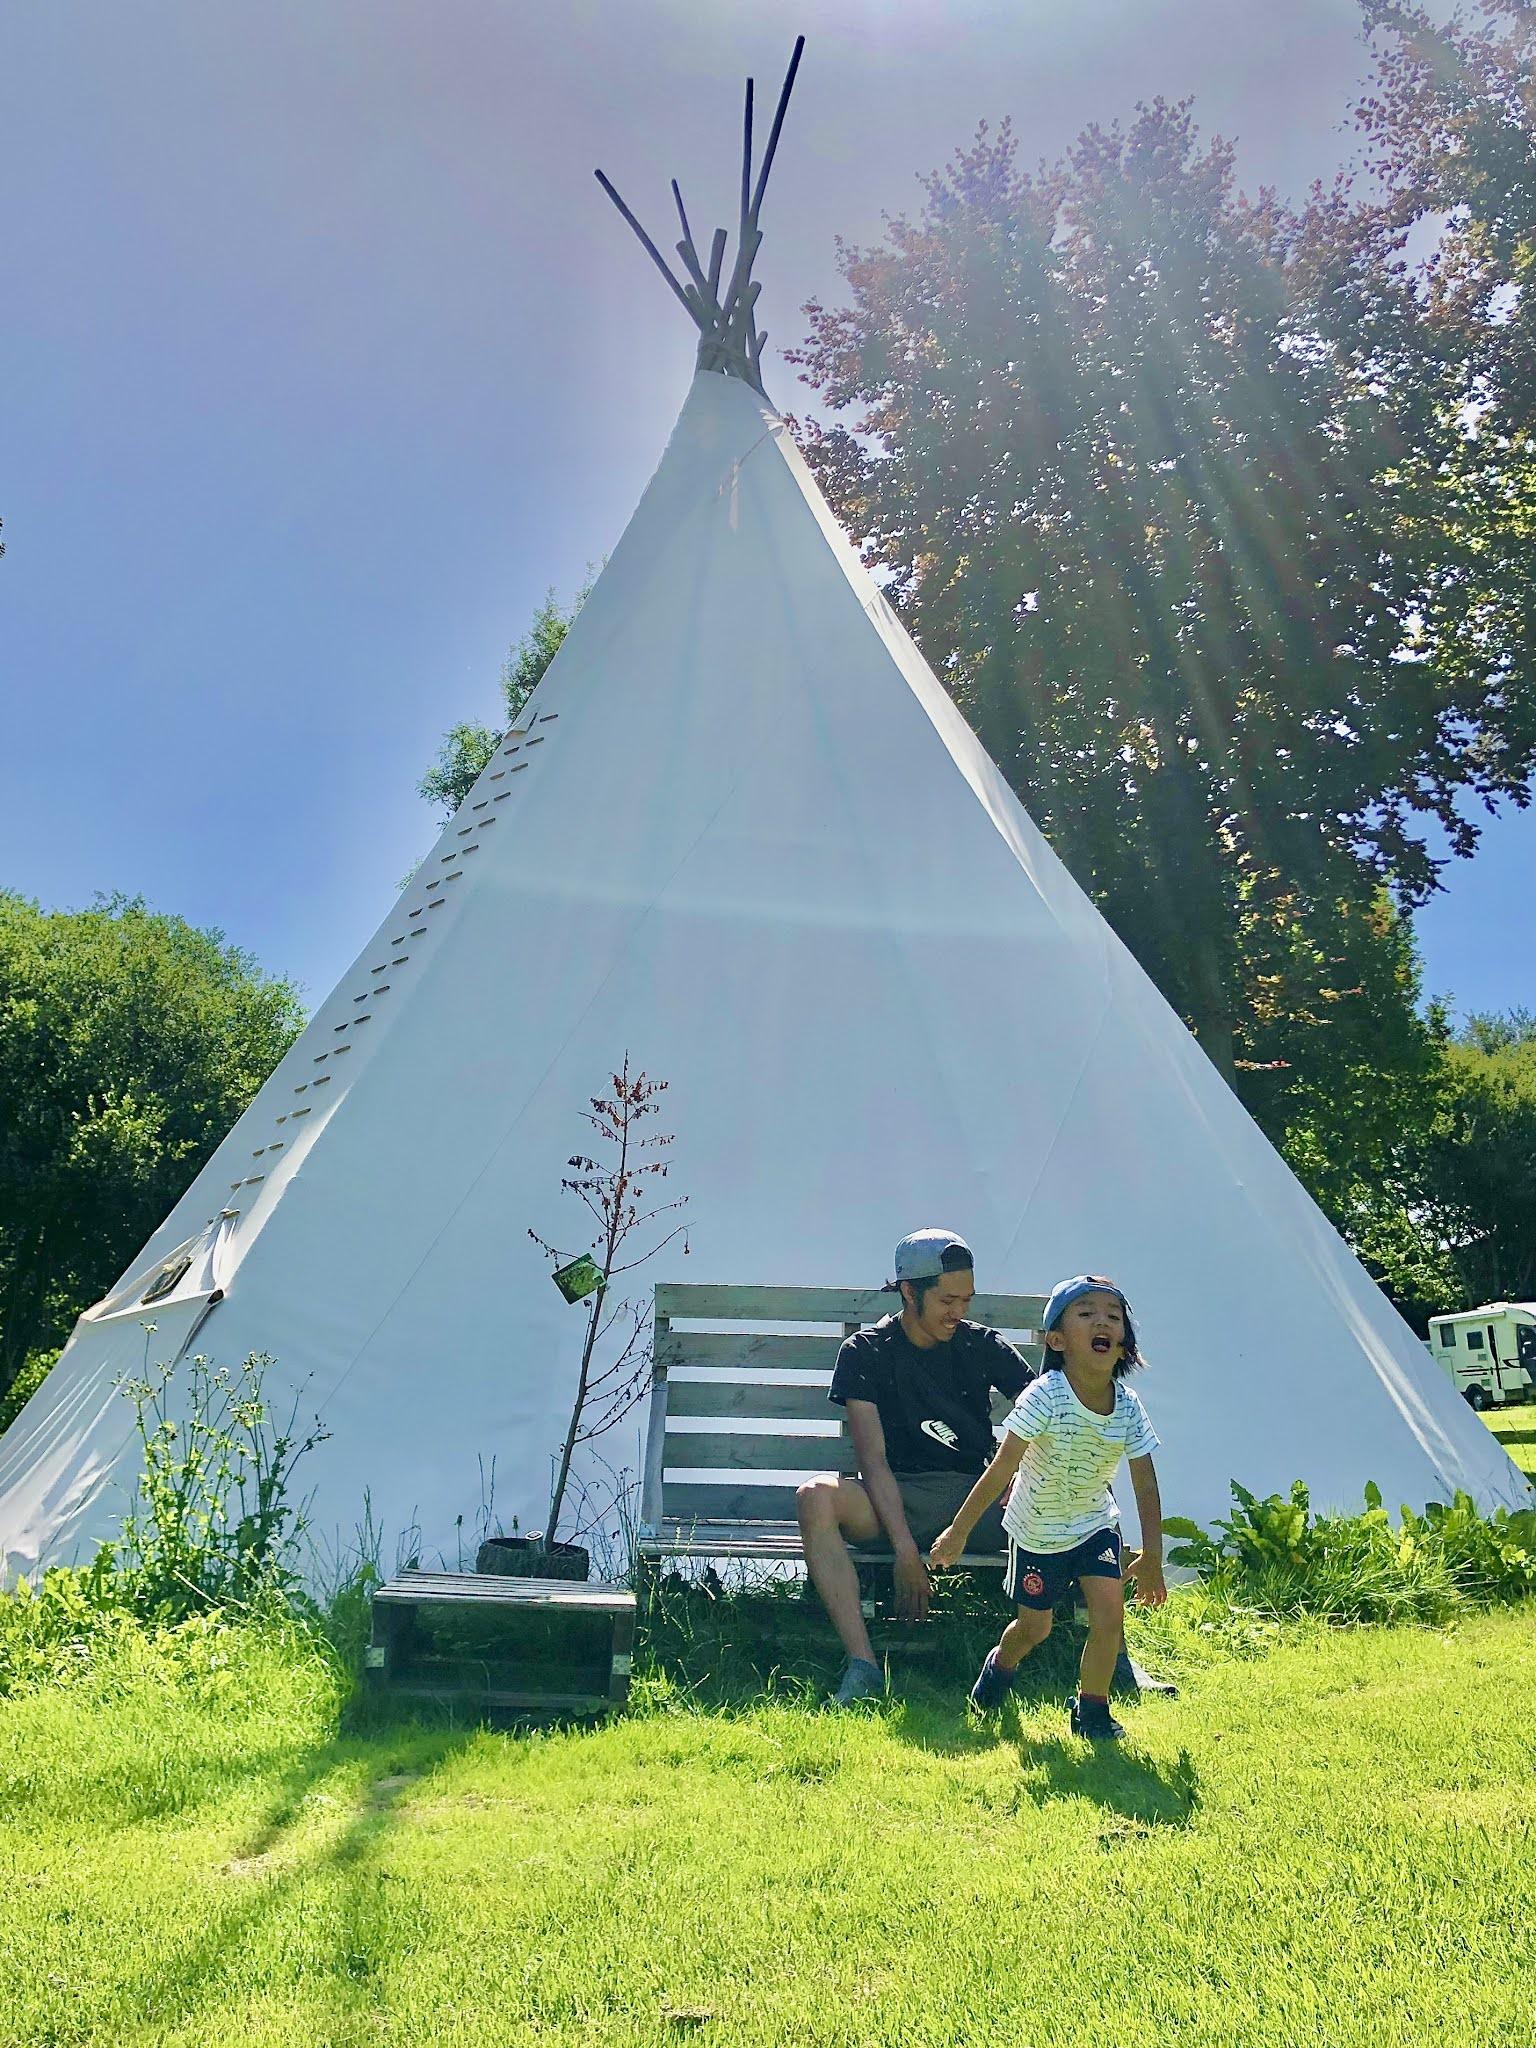 Be Carol Natuurcamping de Kemphaan Almere Summer Camping